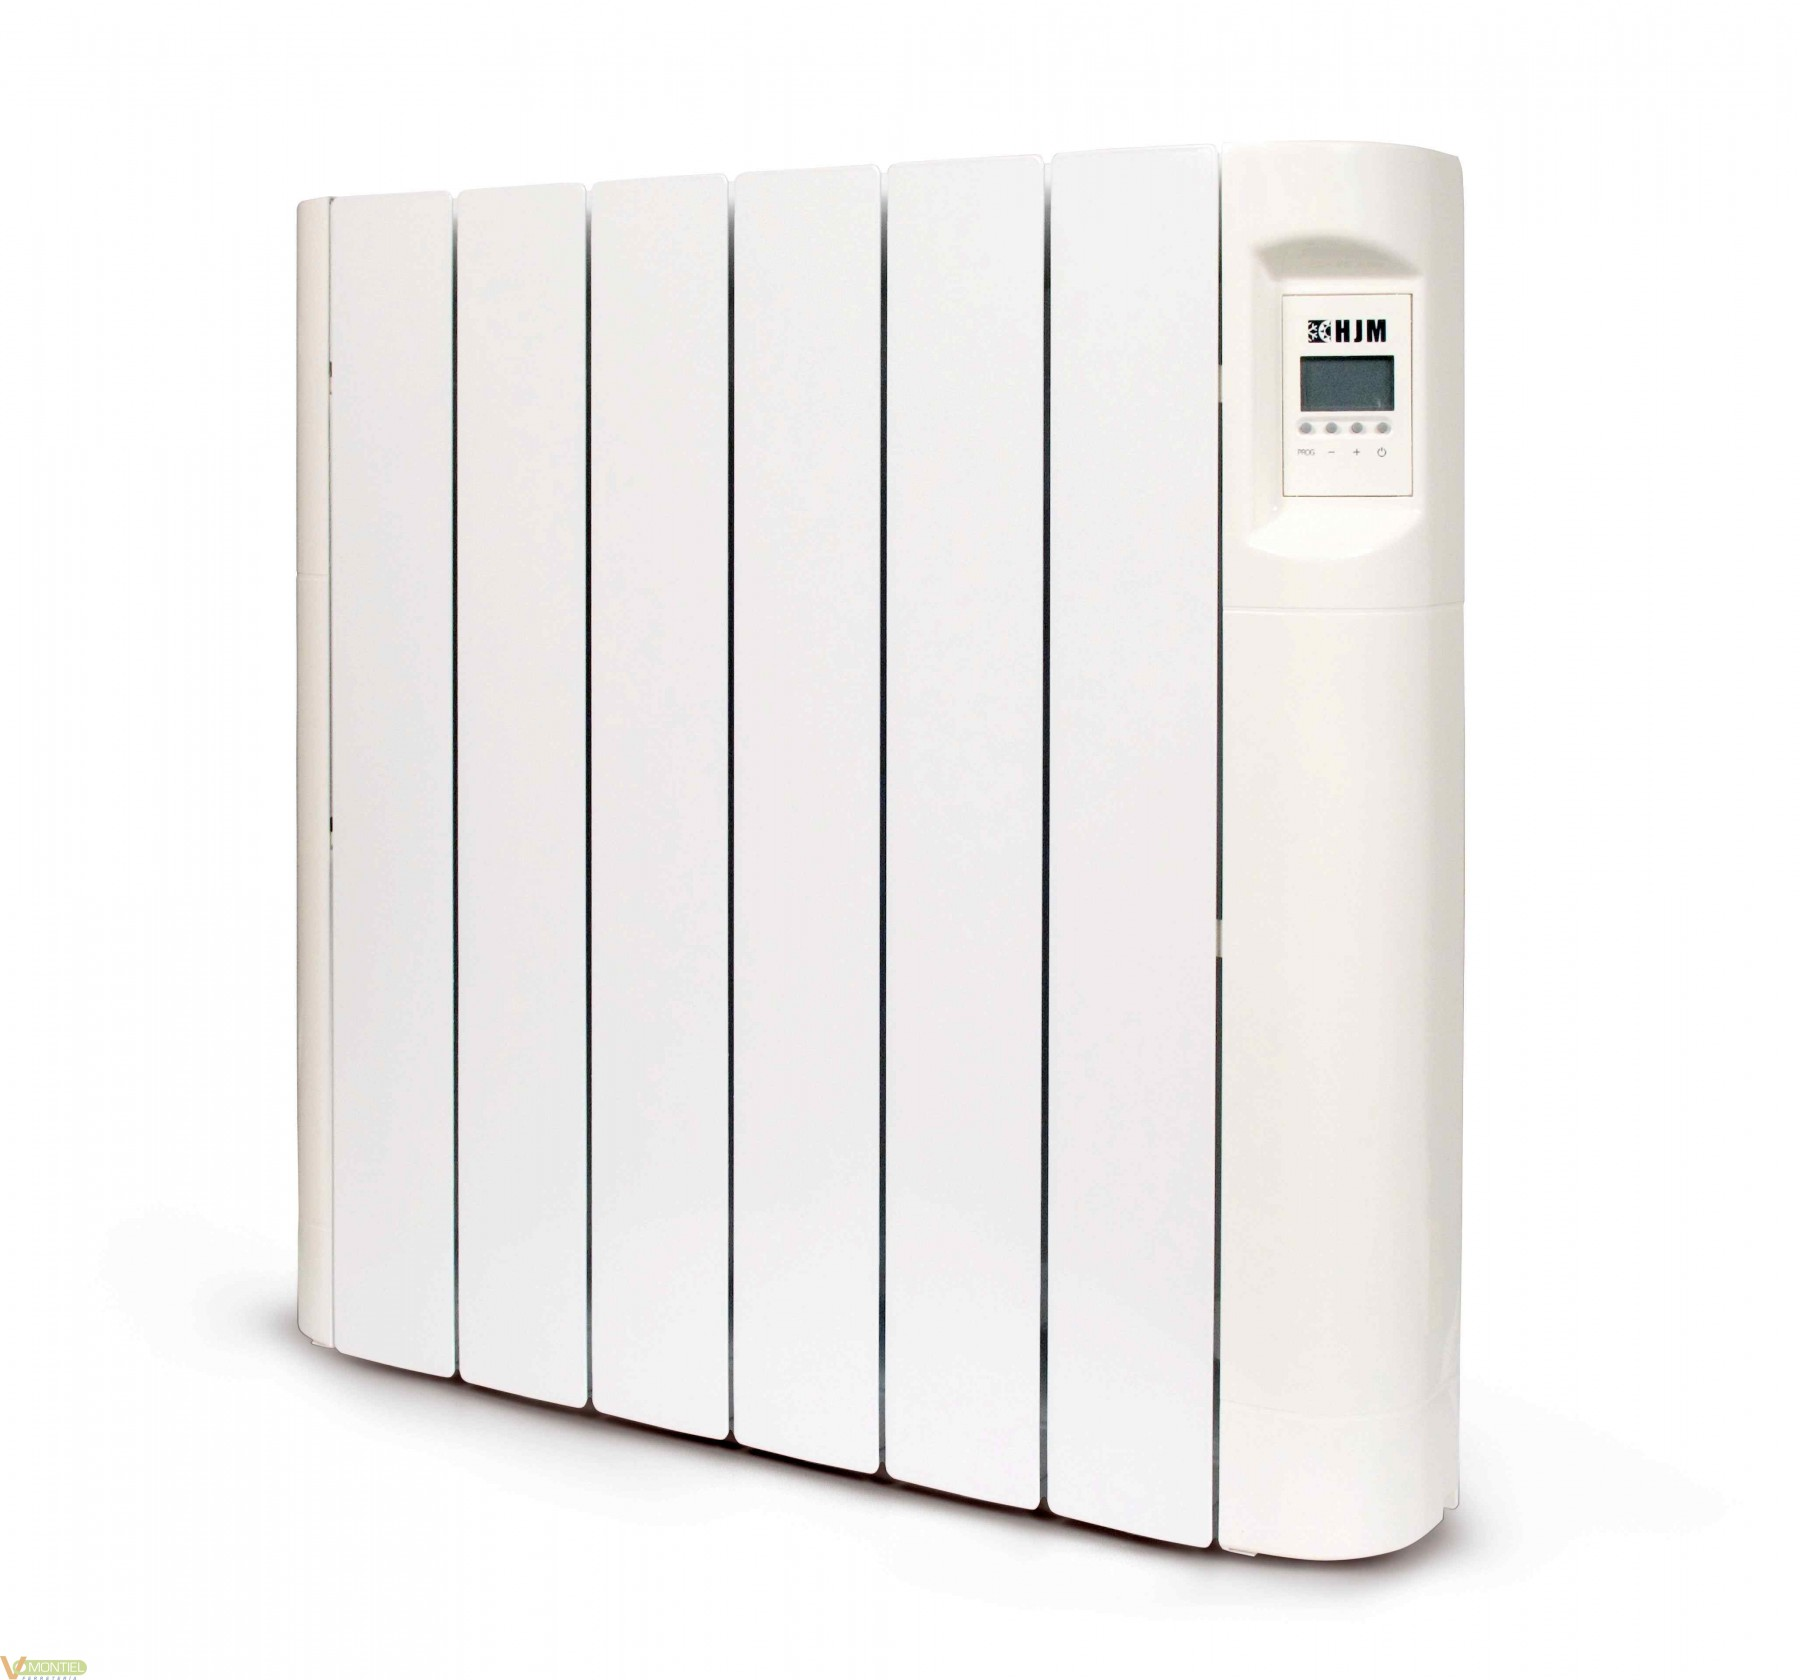 Emisor termico 500 w 4 element-0